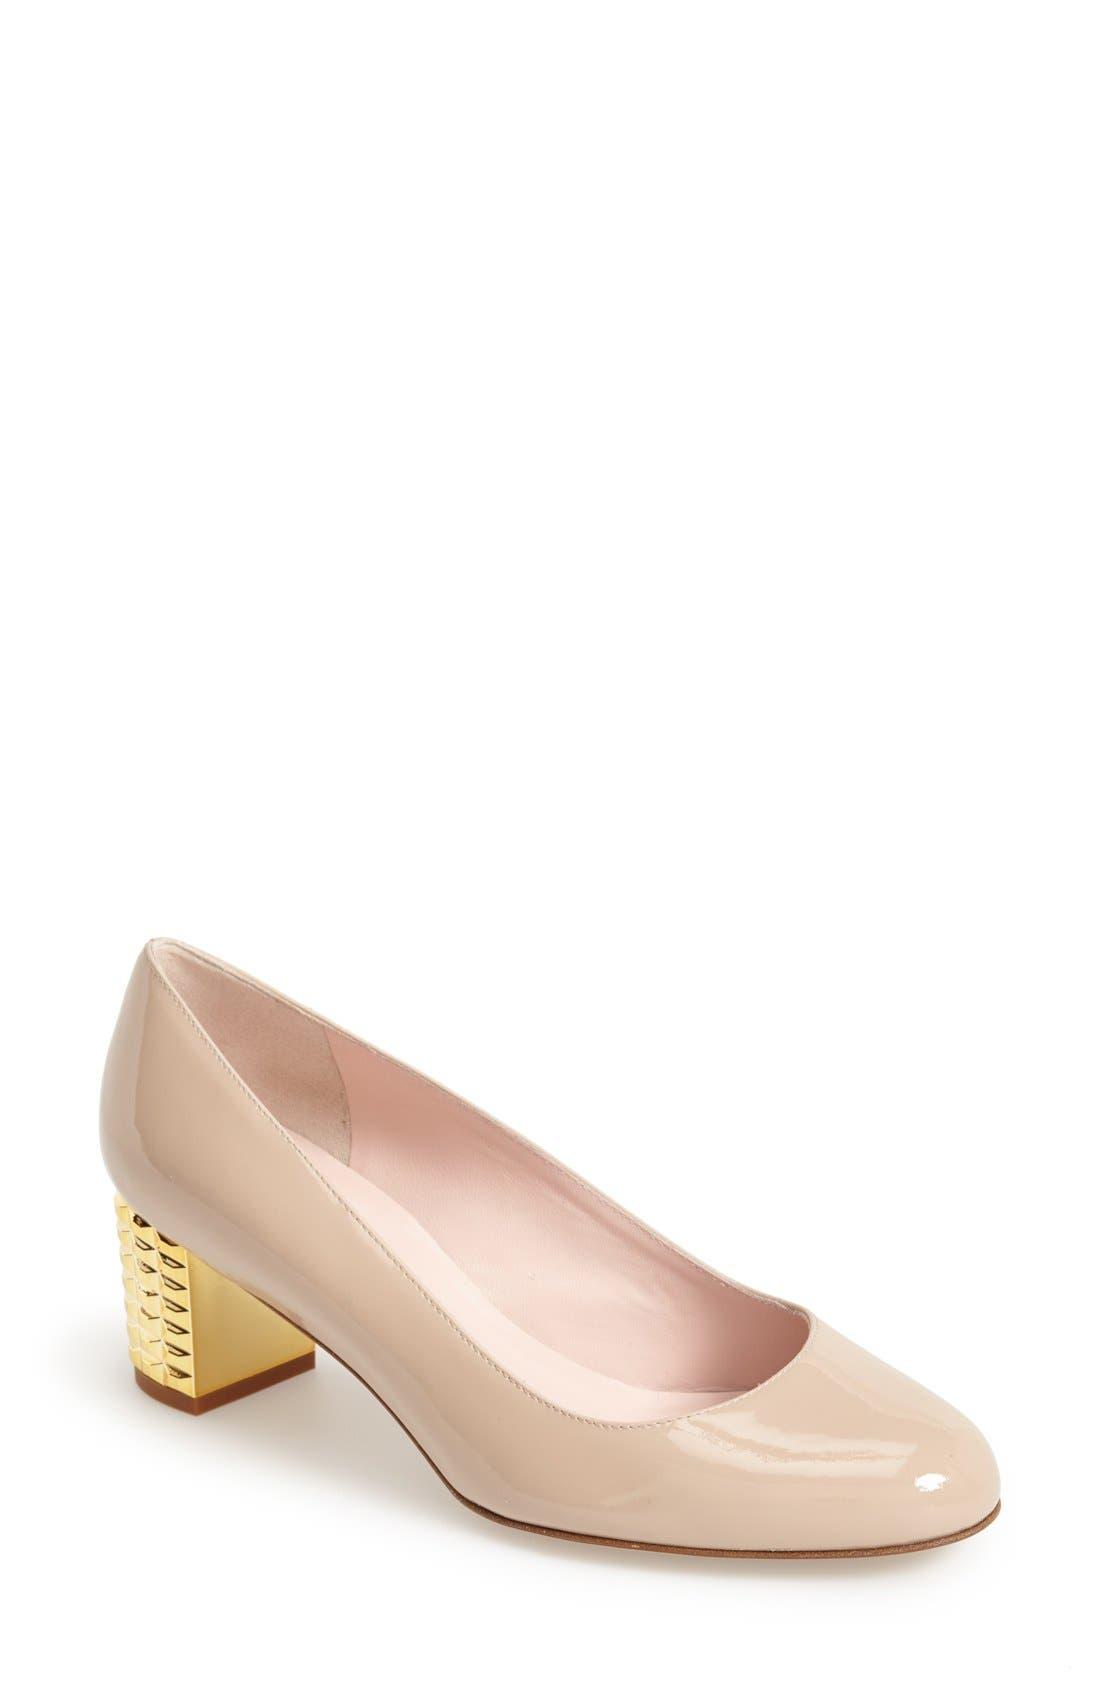 Main Image - kate spade new york 'mahina' round toe leather pump (Women)